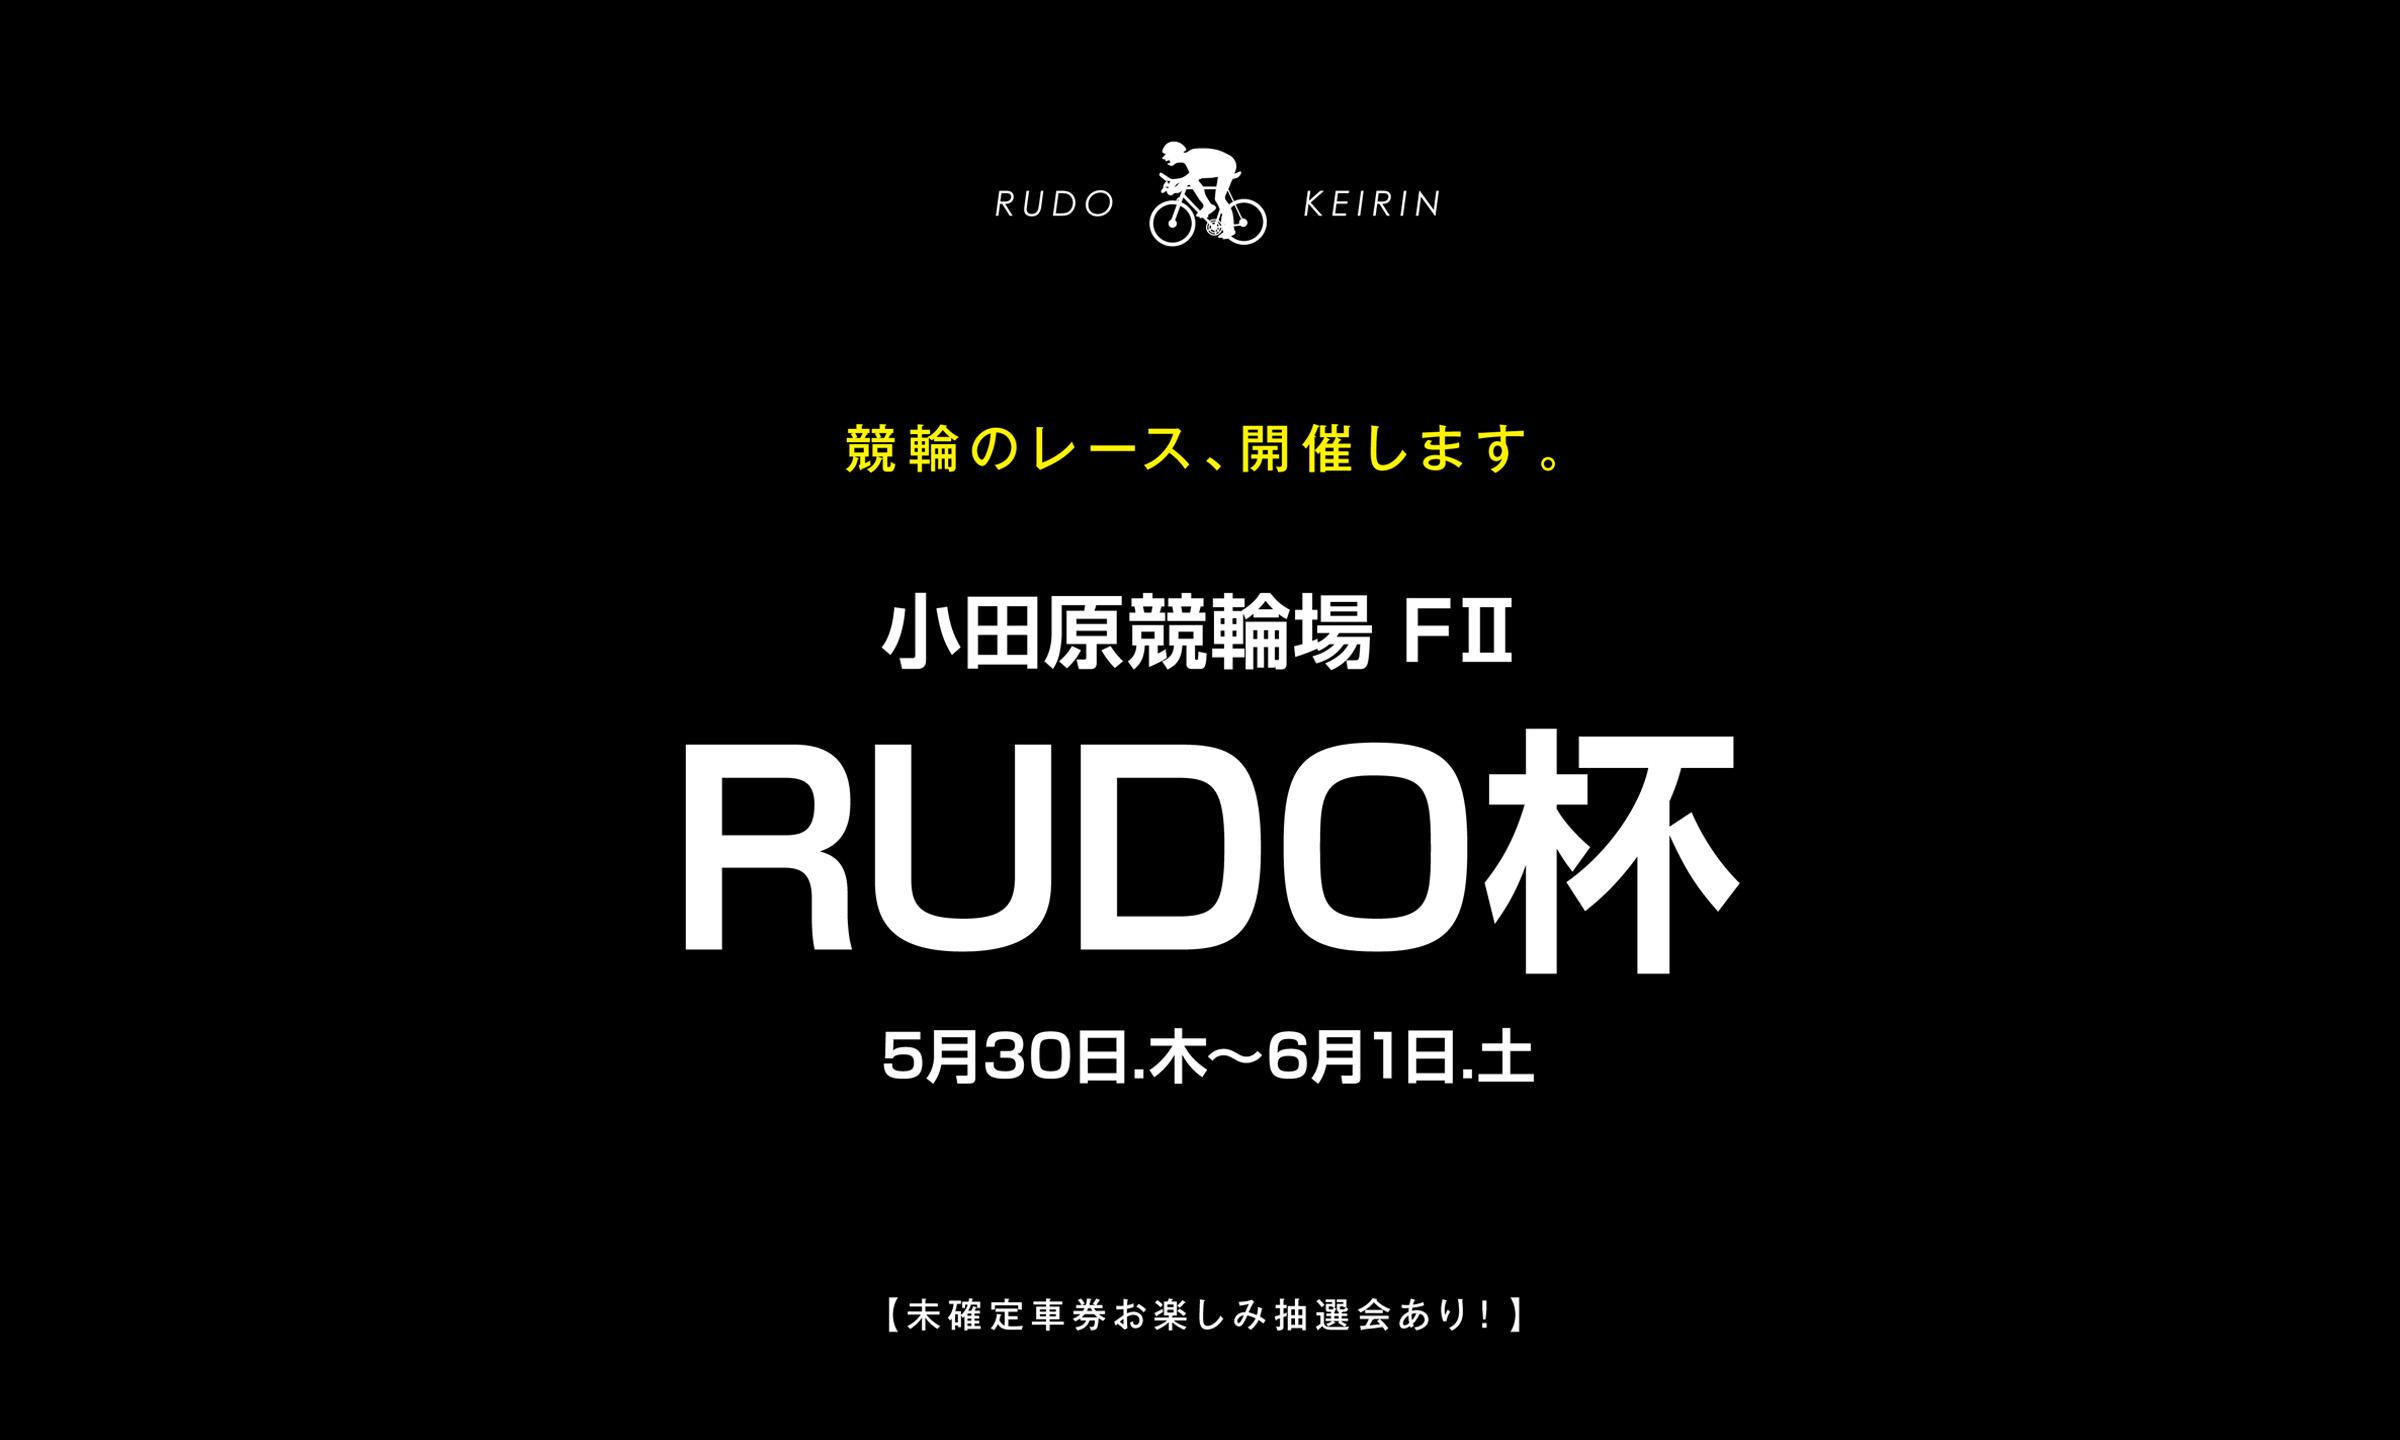 RUDOが競輪とコラボしてレースを開催! 小田原競輪場「RUDO杯」5月30日〜6月1日